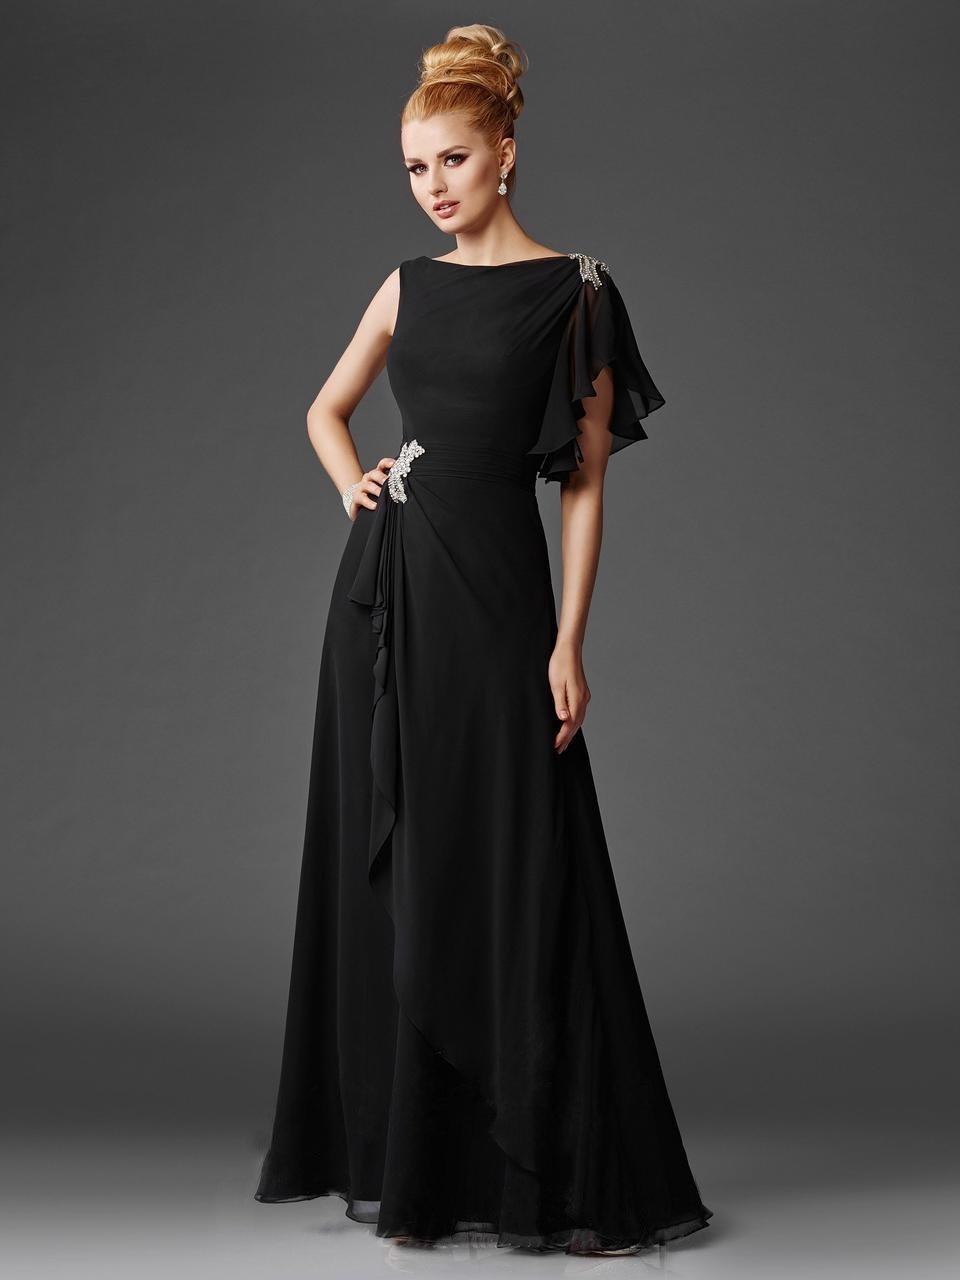 Clarisse - M6401 Chiffon Bateau A-line Dress